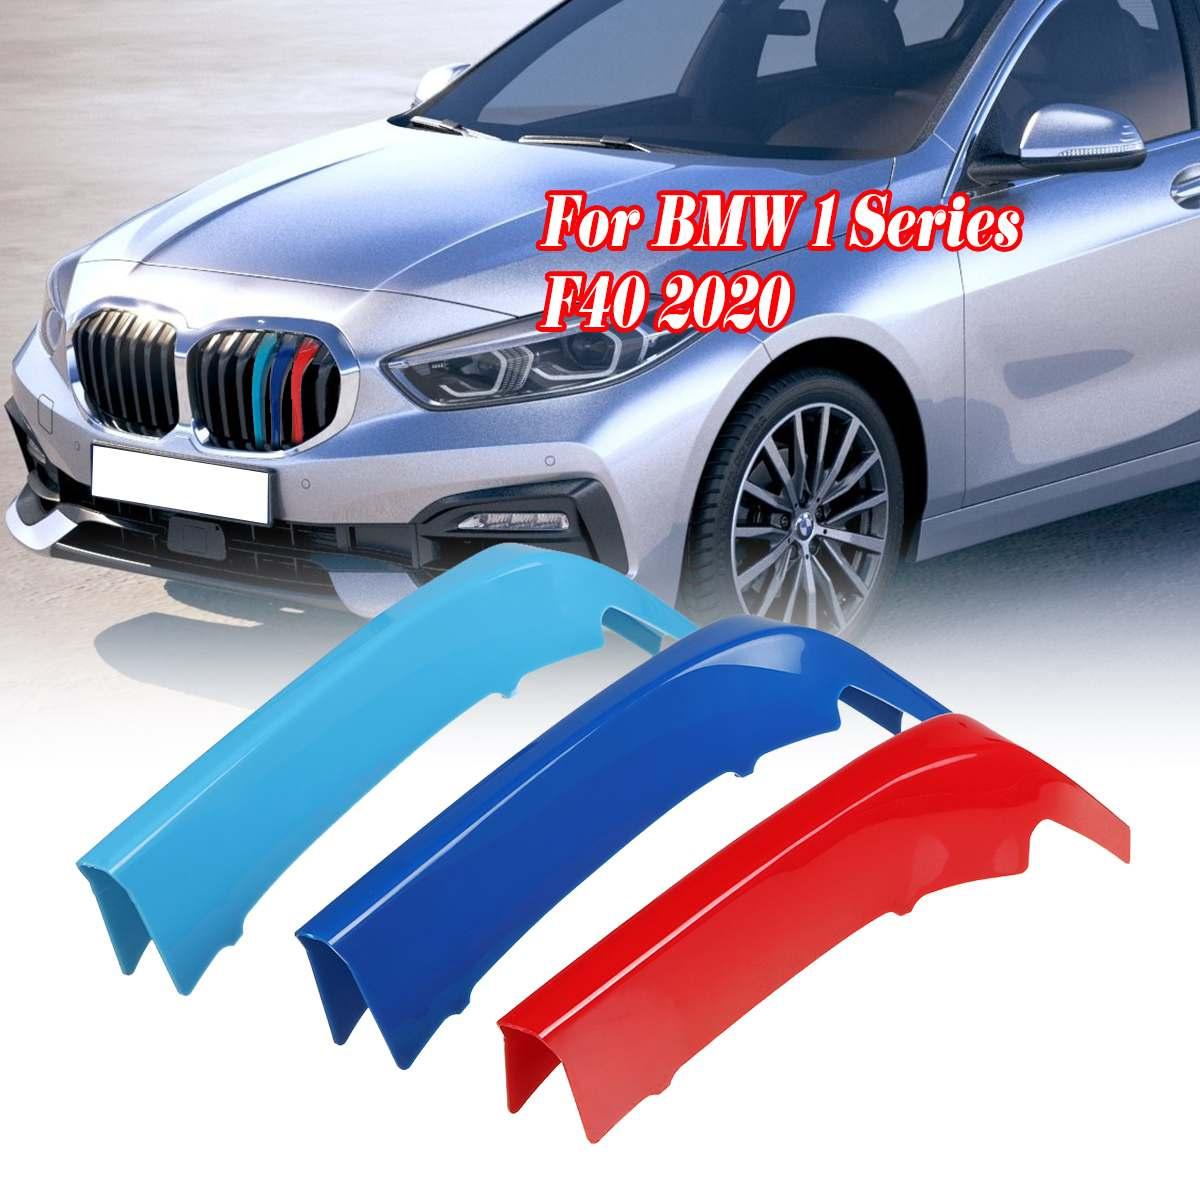 3 uds Car 3D M Styling embellecedor de rejilla delantera parachoques cubierta tira tiras pegatinas cubierta para BMW 1 serie F40 2020